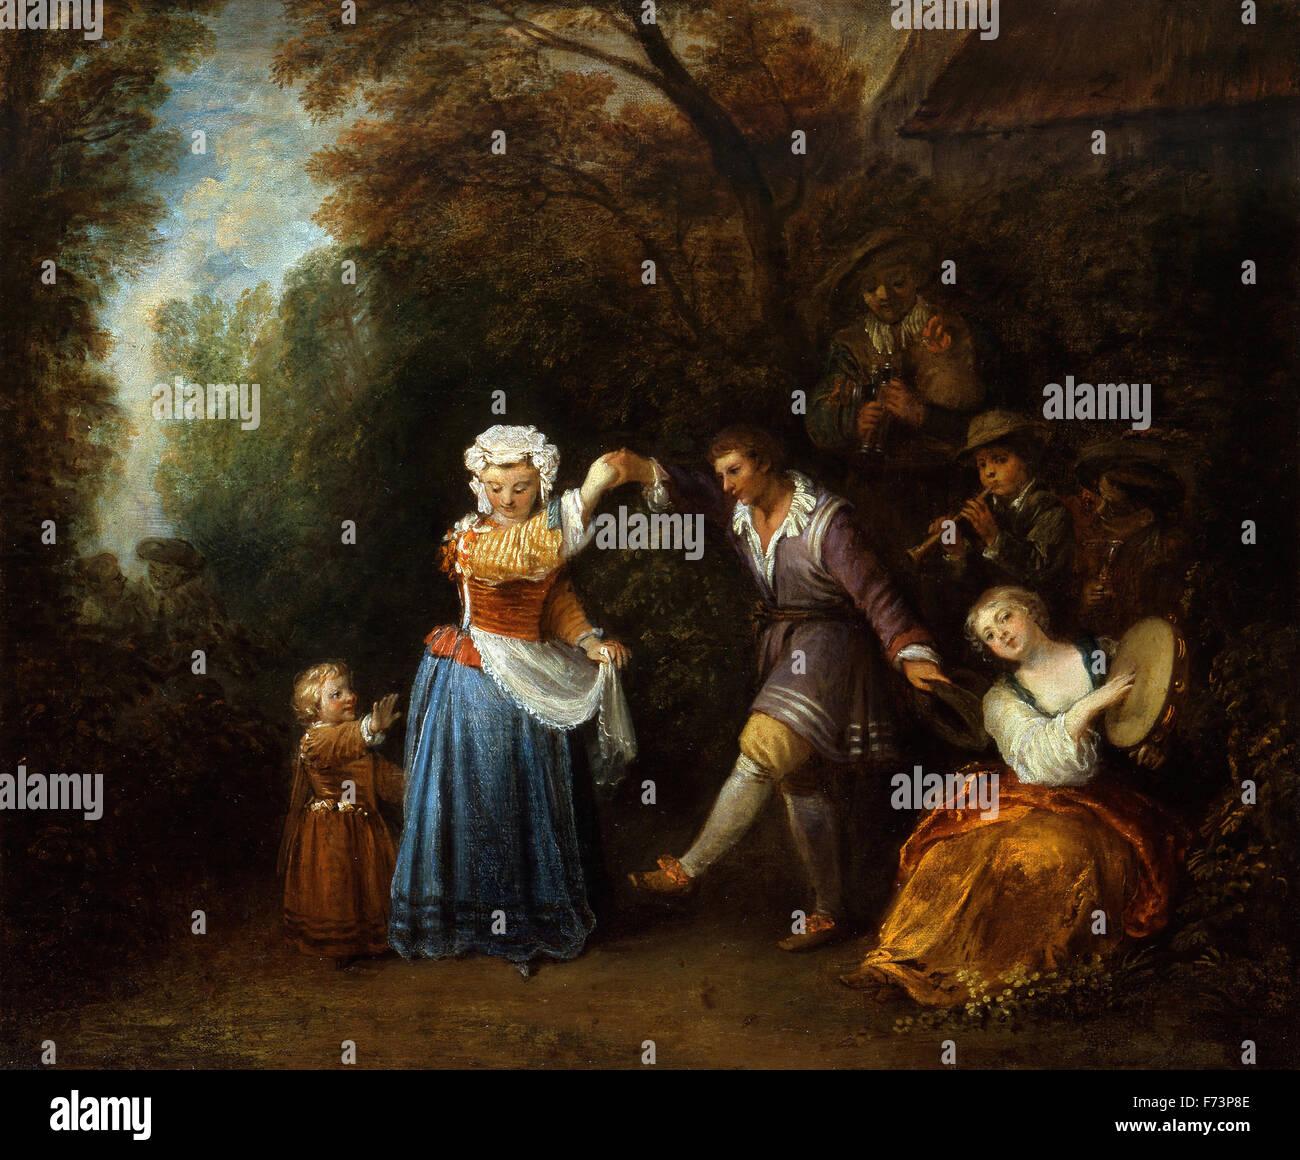 Jean-Antoine Watteau - der Landler Stockbild